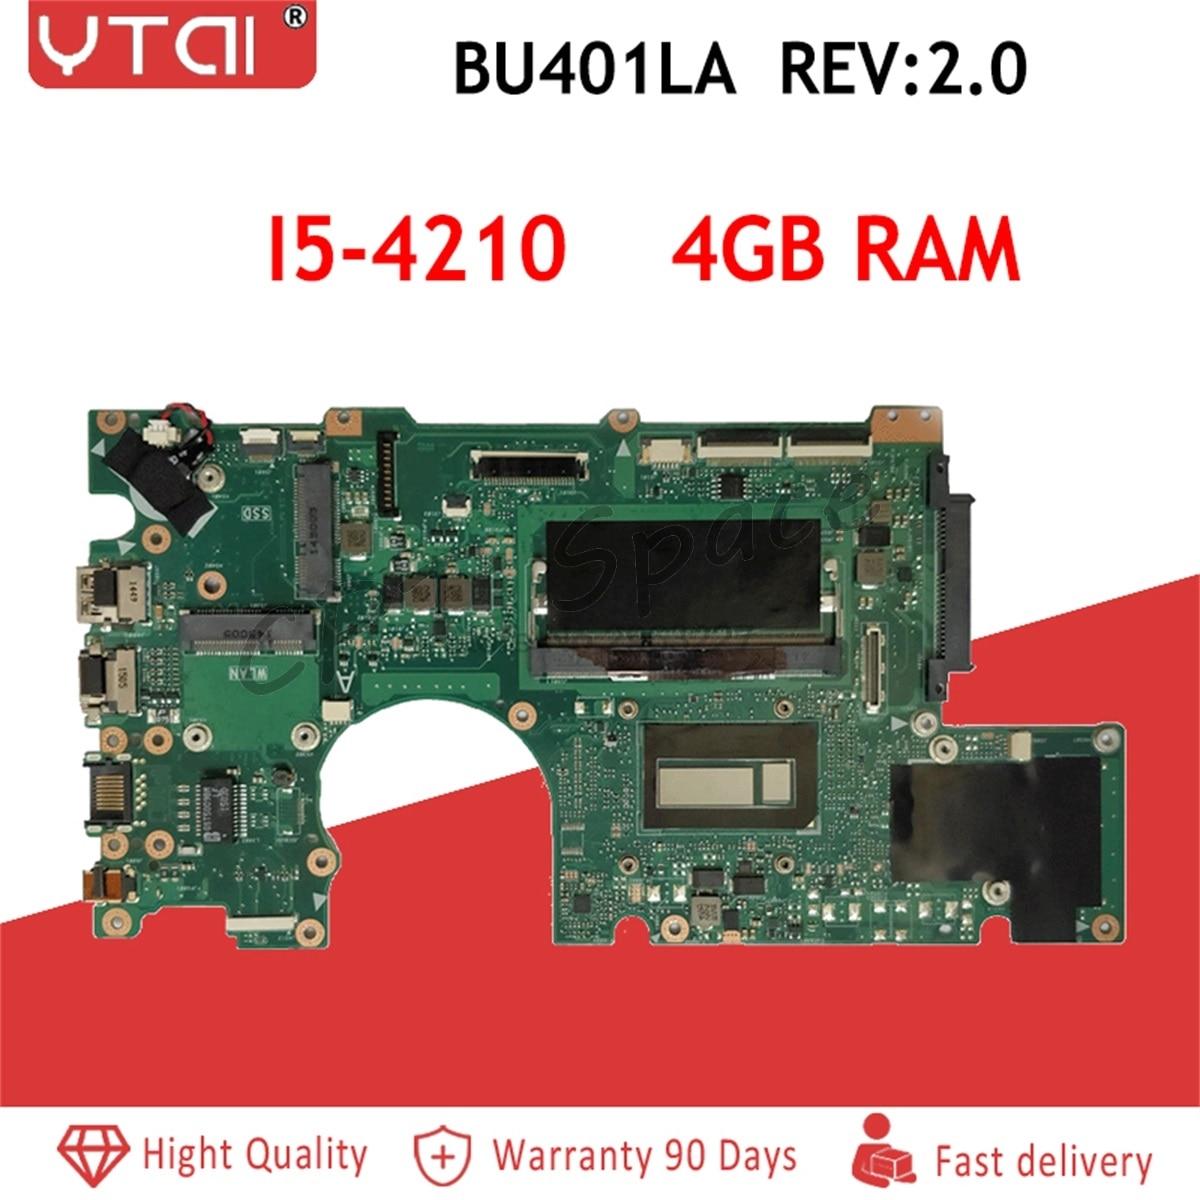 BU401LA Материнская плата Процессор I5 4210 4 Гб ram материнская плата для ASUS BU401L BU401LA ноутбук материнская плата